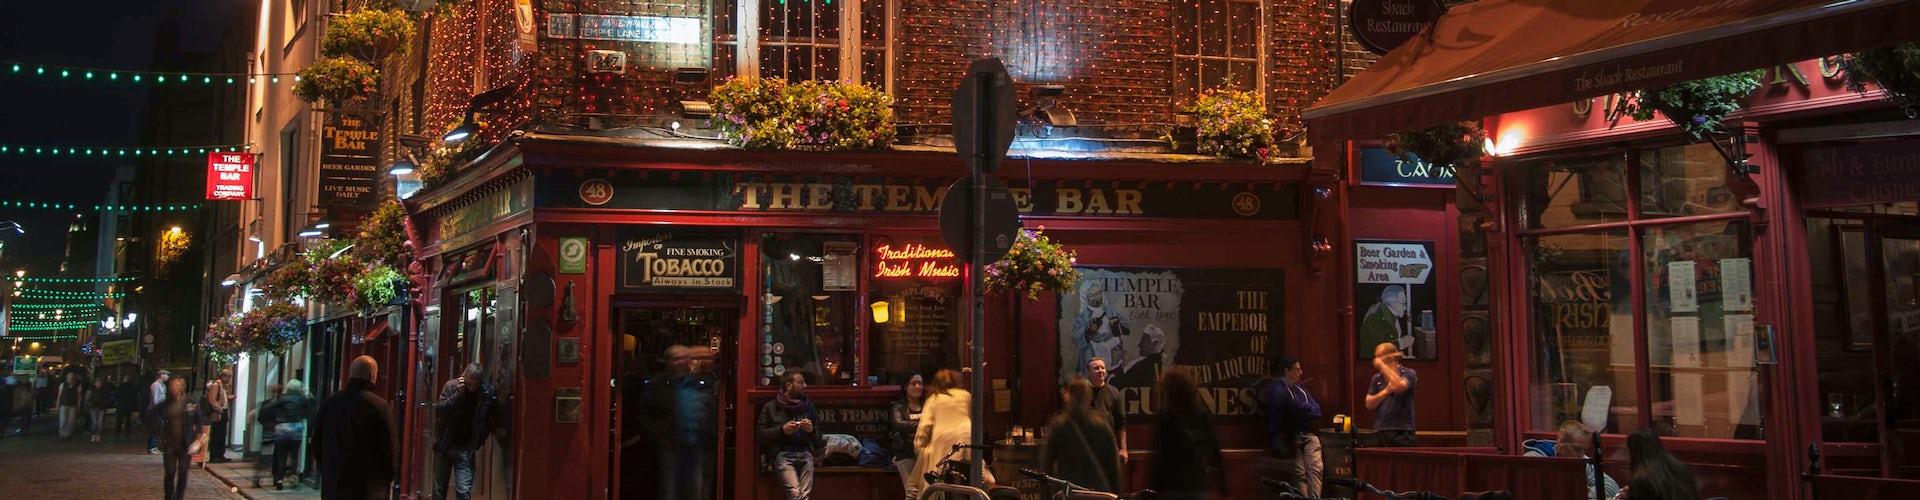 Tour Temple Bar Dublin 1